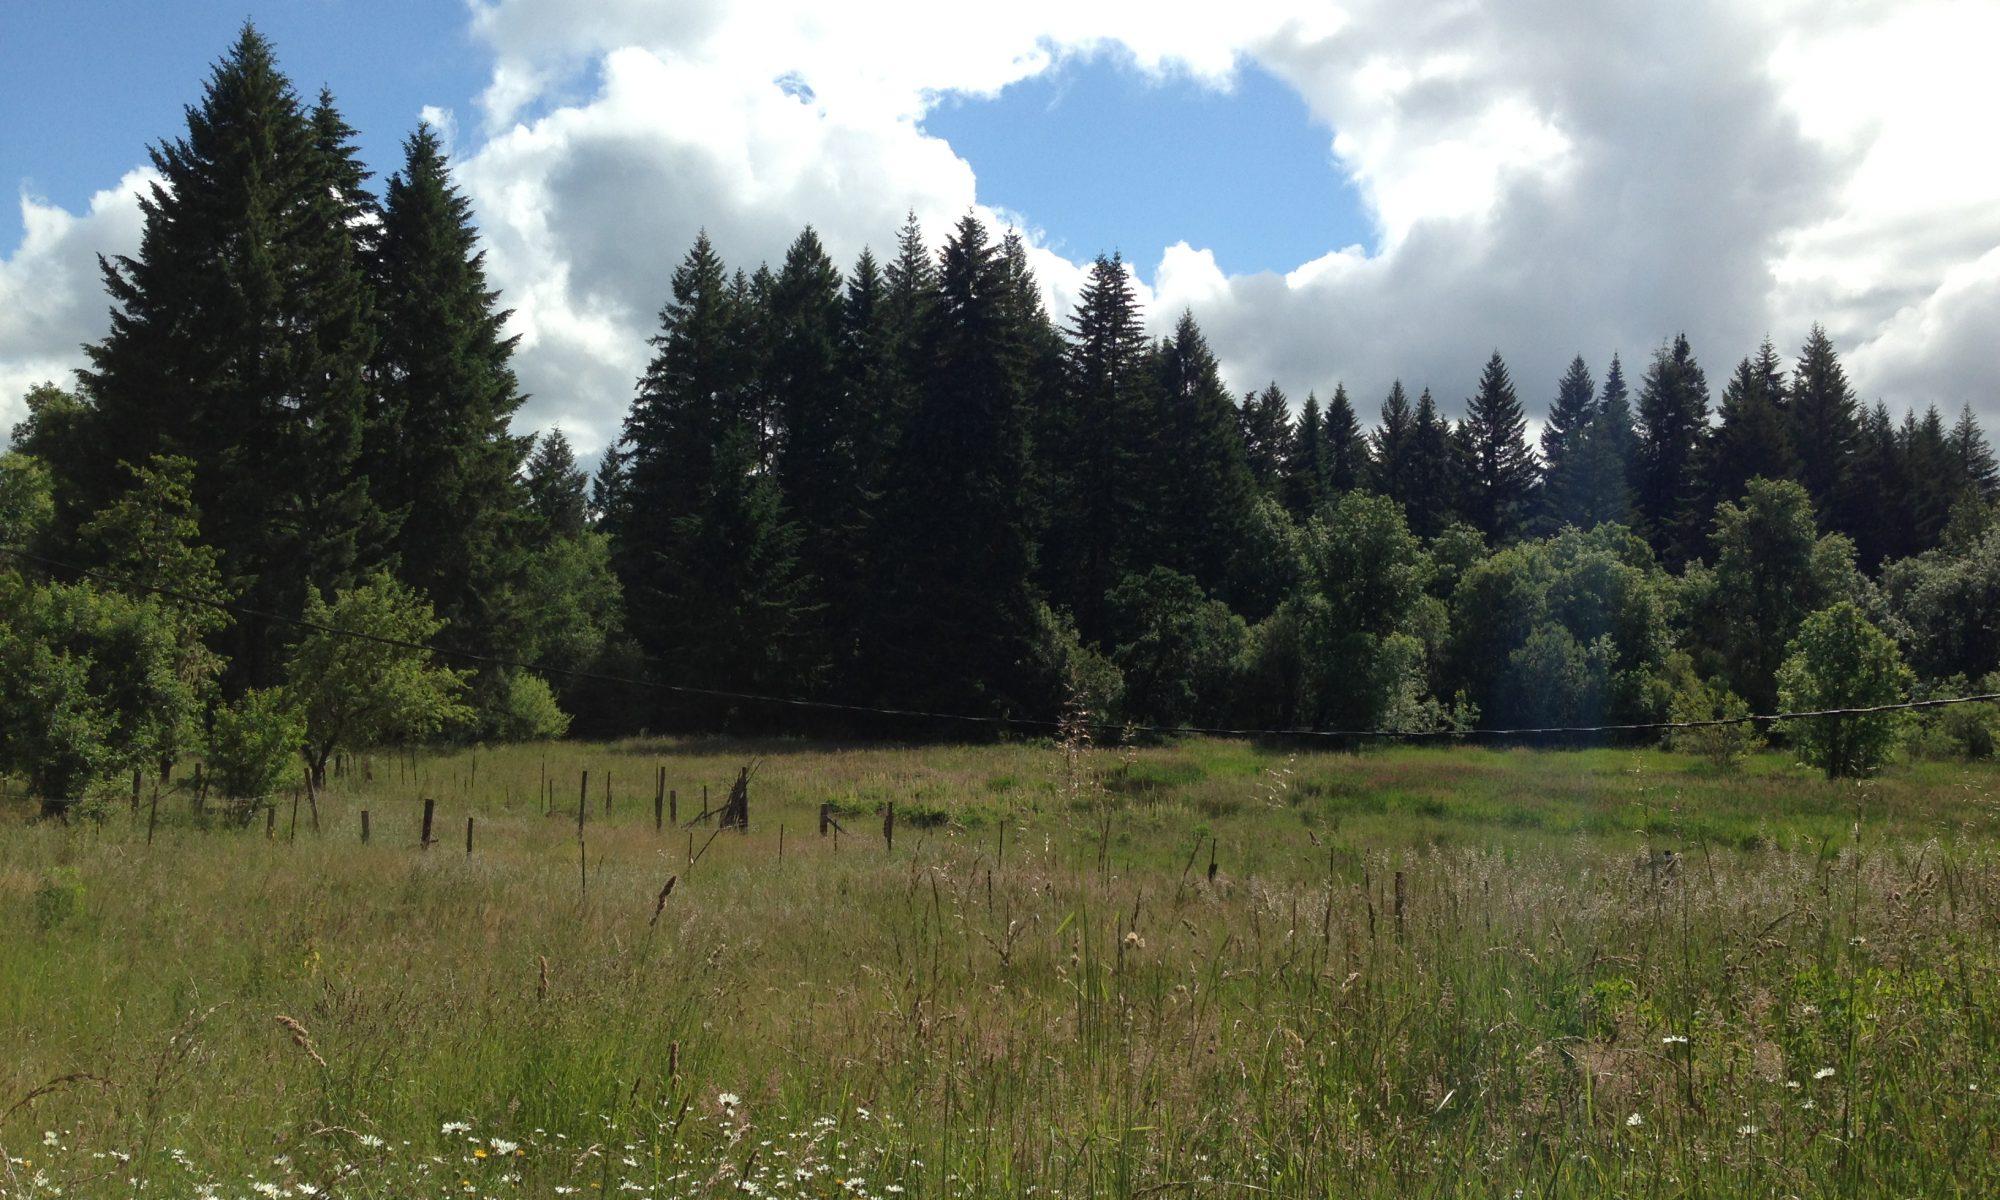 Everfree Farm